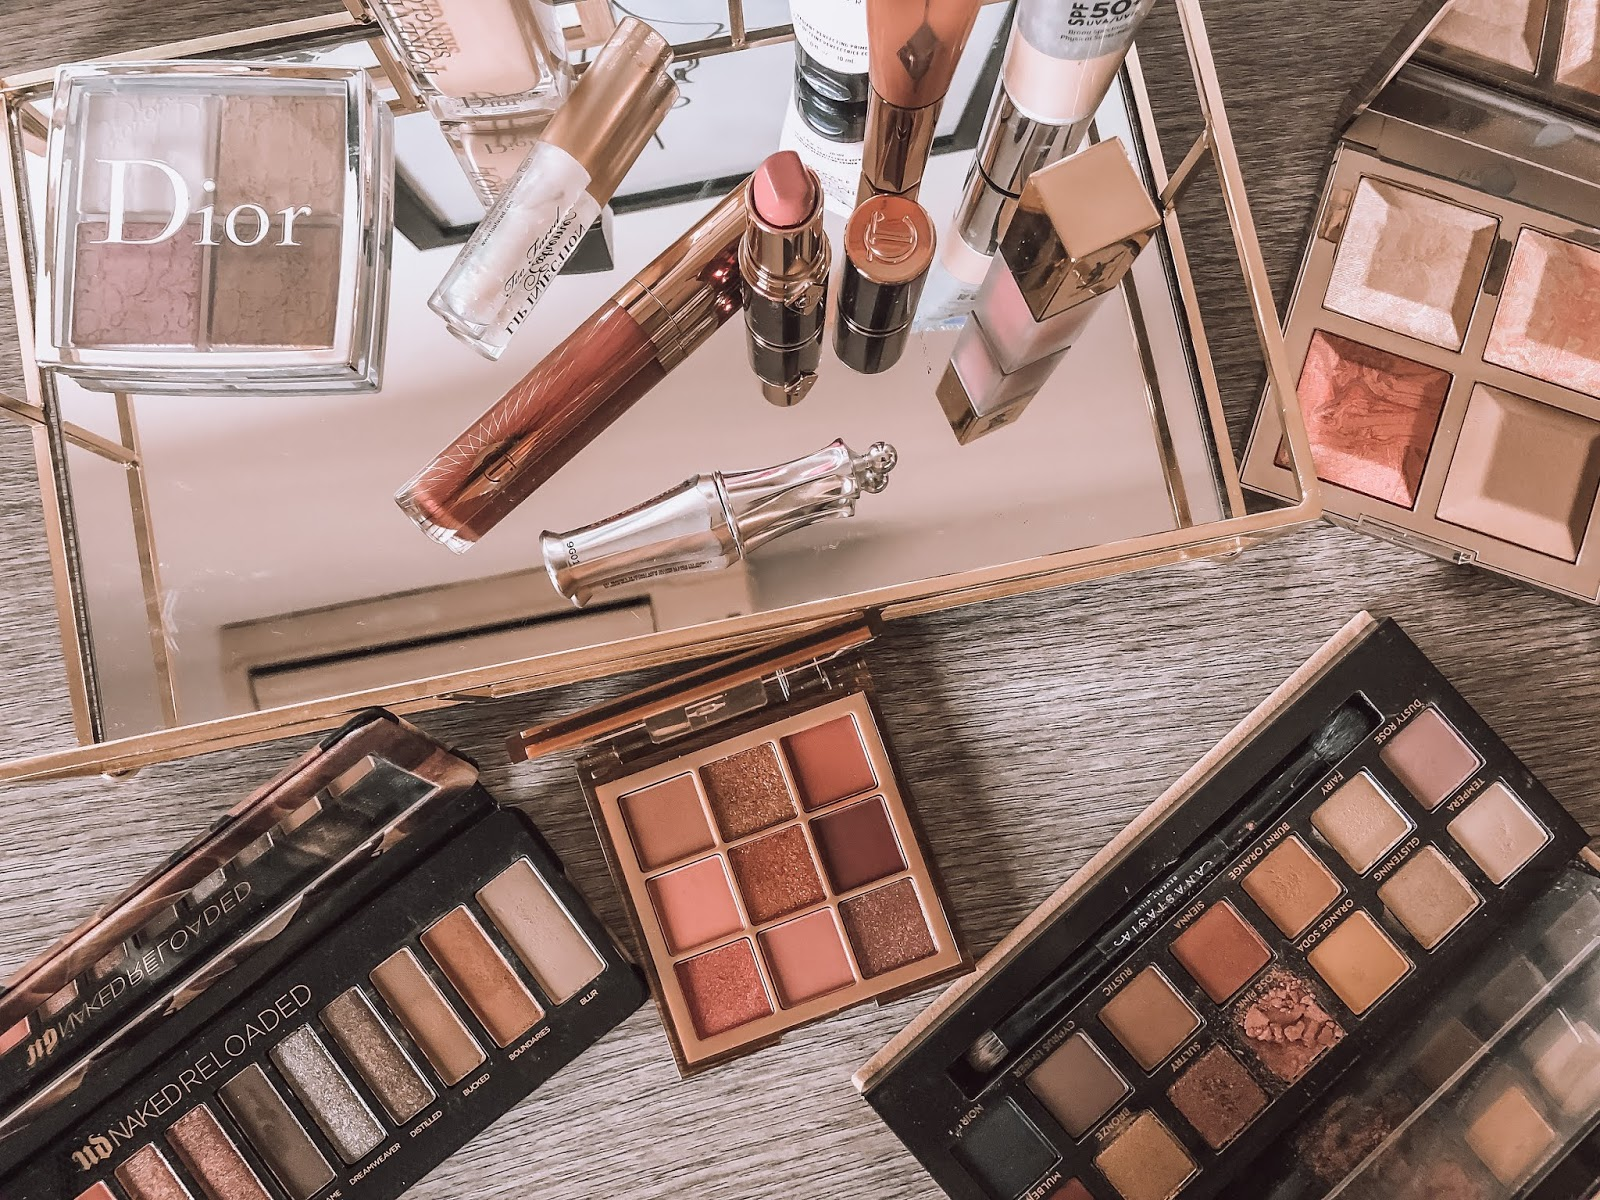 2019 beauty favorites, charlotte tilbury, dior, it cosmetics, abh, becca, huda,